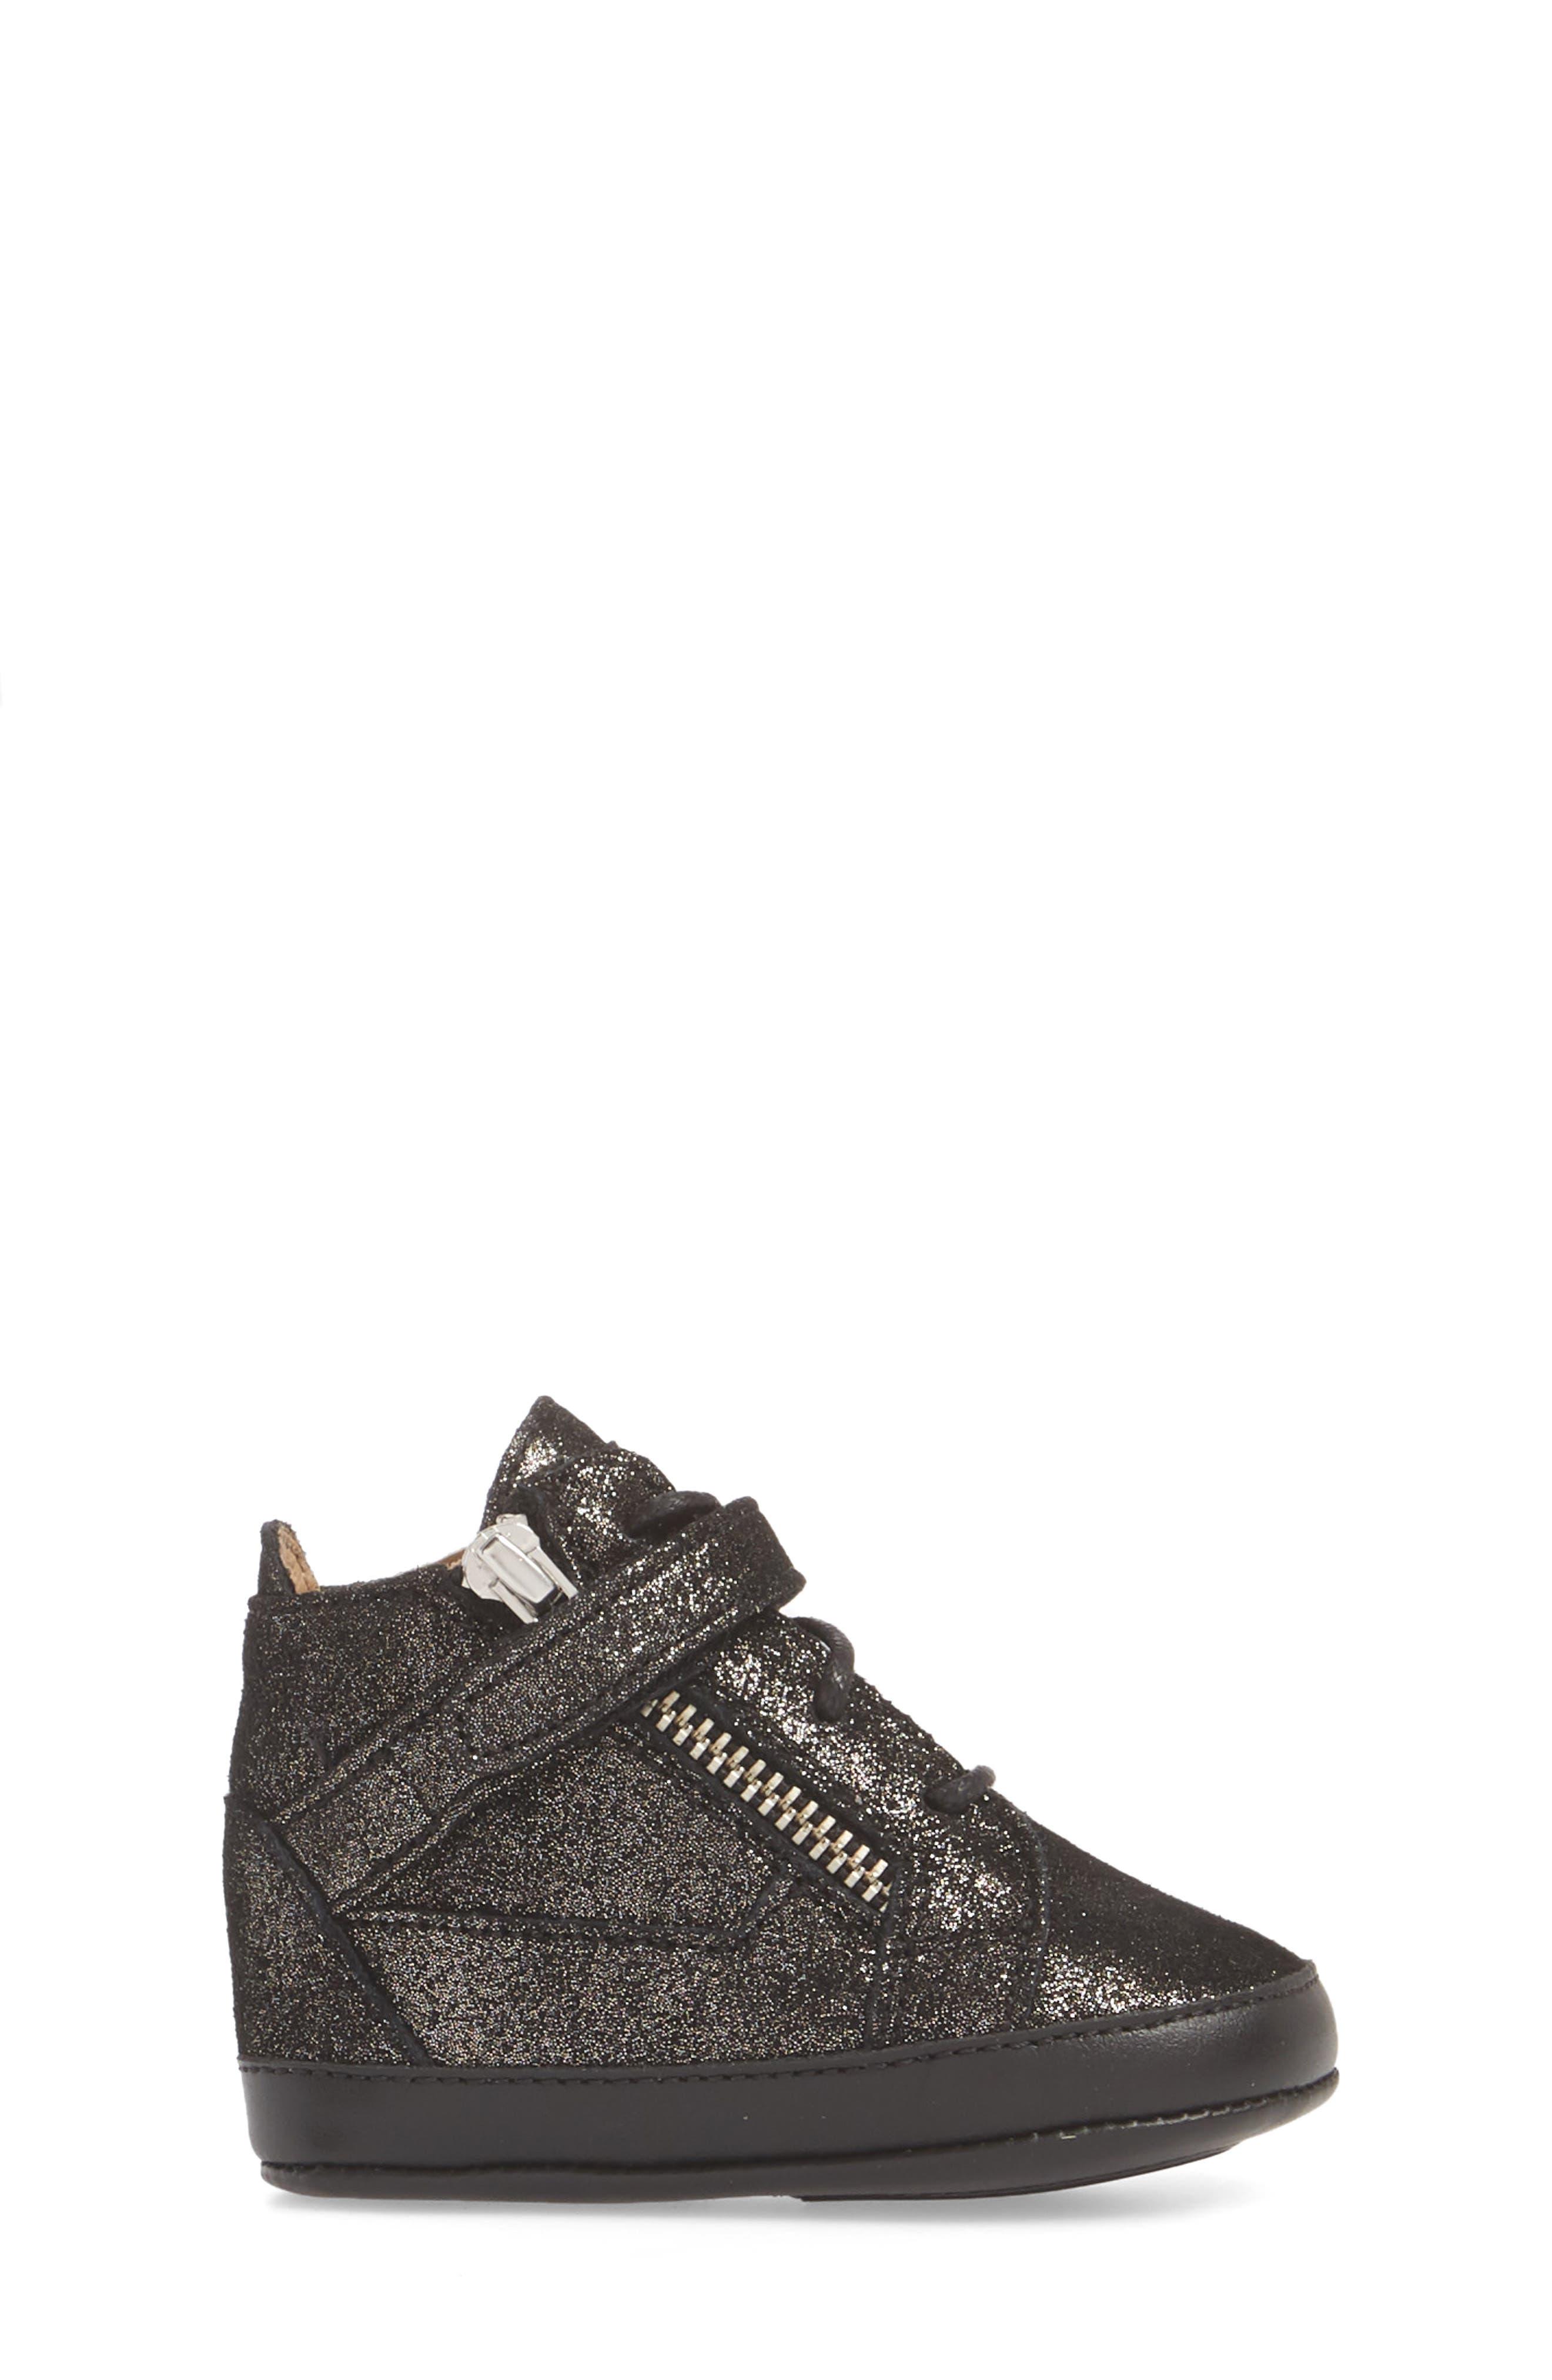 Culla London High Top Crib Sneaker,                             Alternate thumbnail 3, color,                             Black Glitter